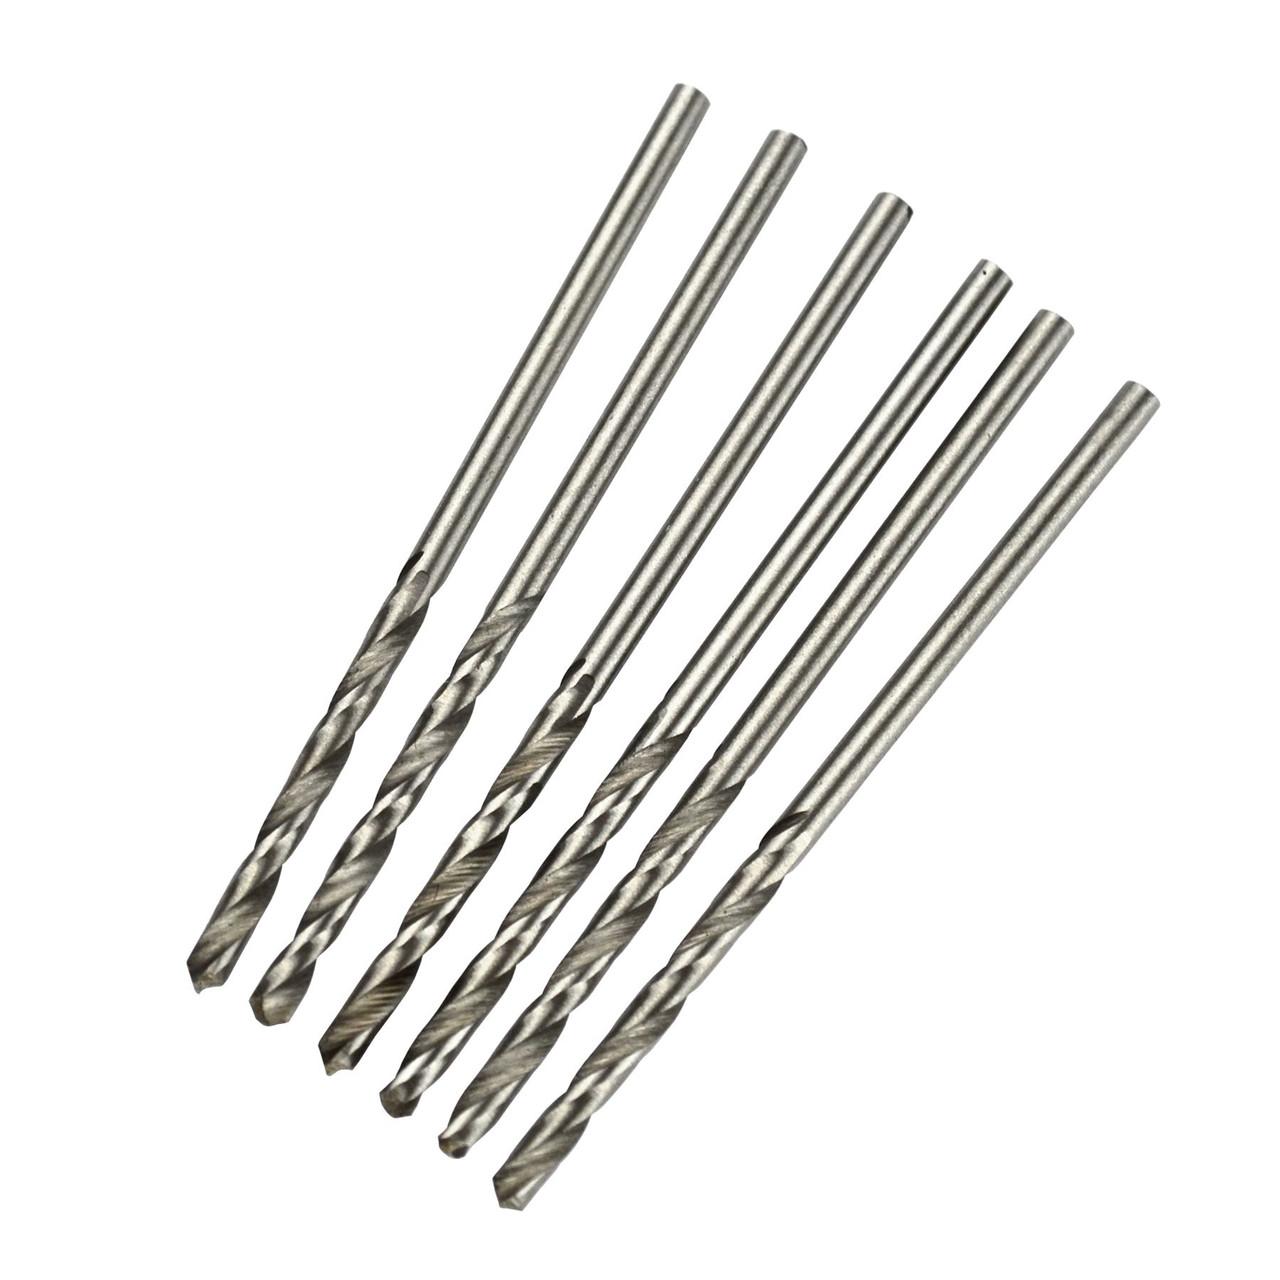 8 pcs 2.5mm long series HSS drills TE099